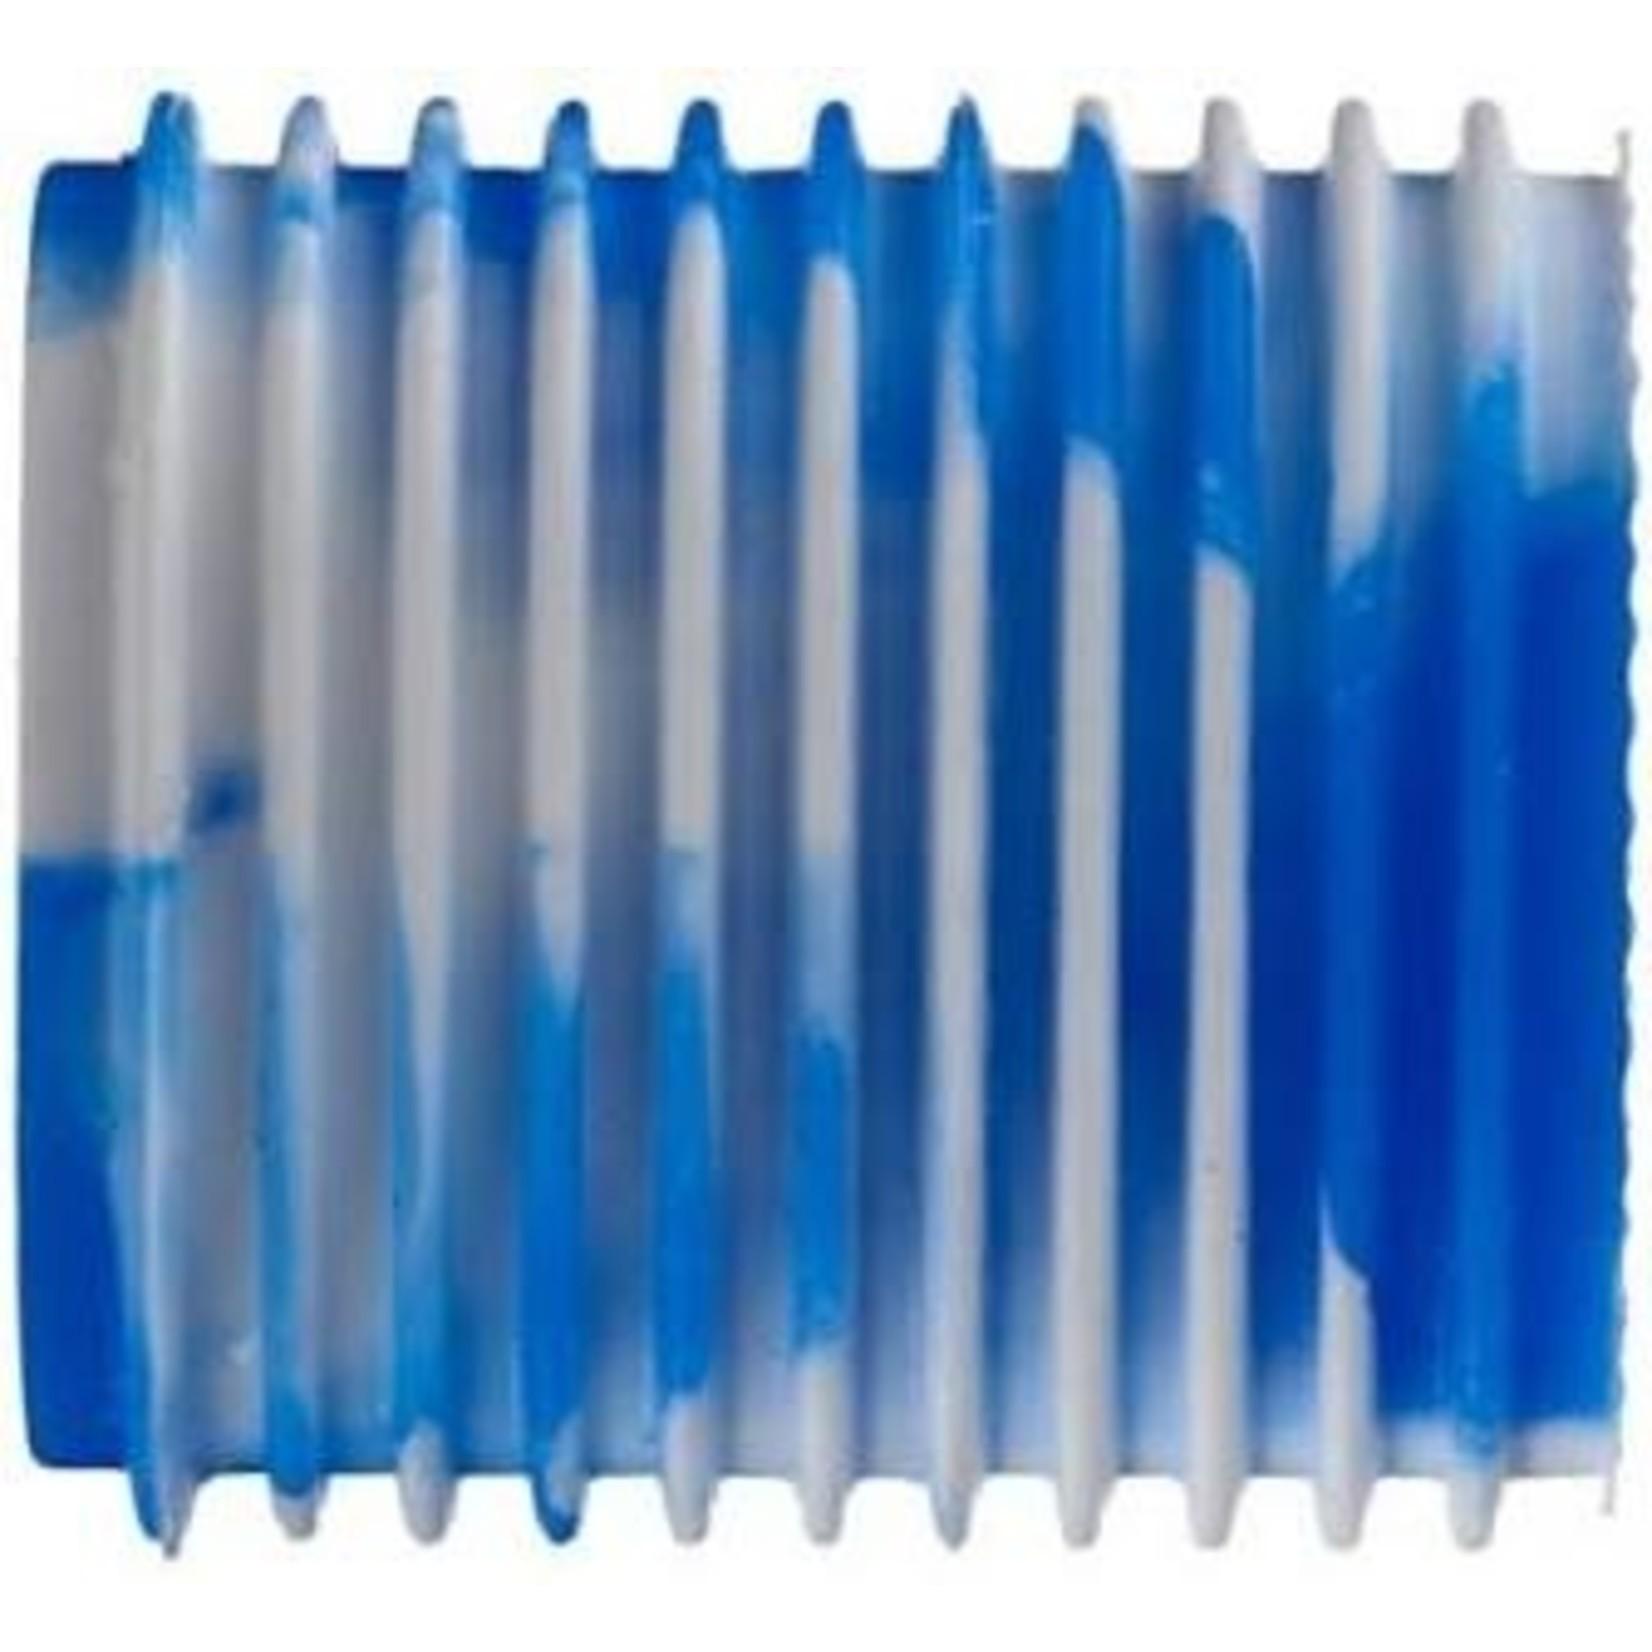 Reel Grip  Slip On Rubber Reel Handle Knob Cover